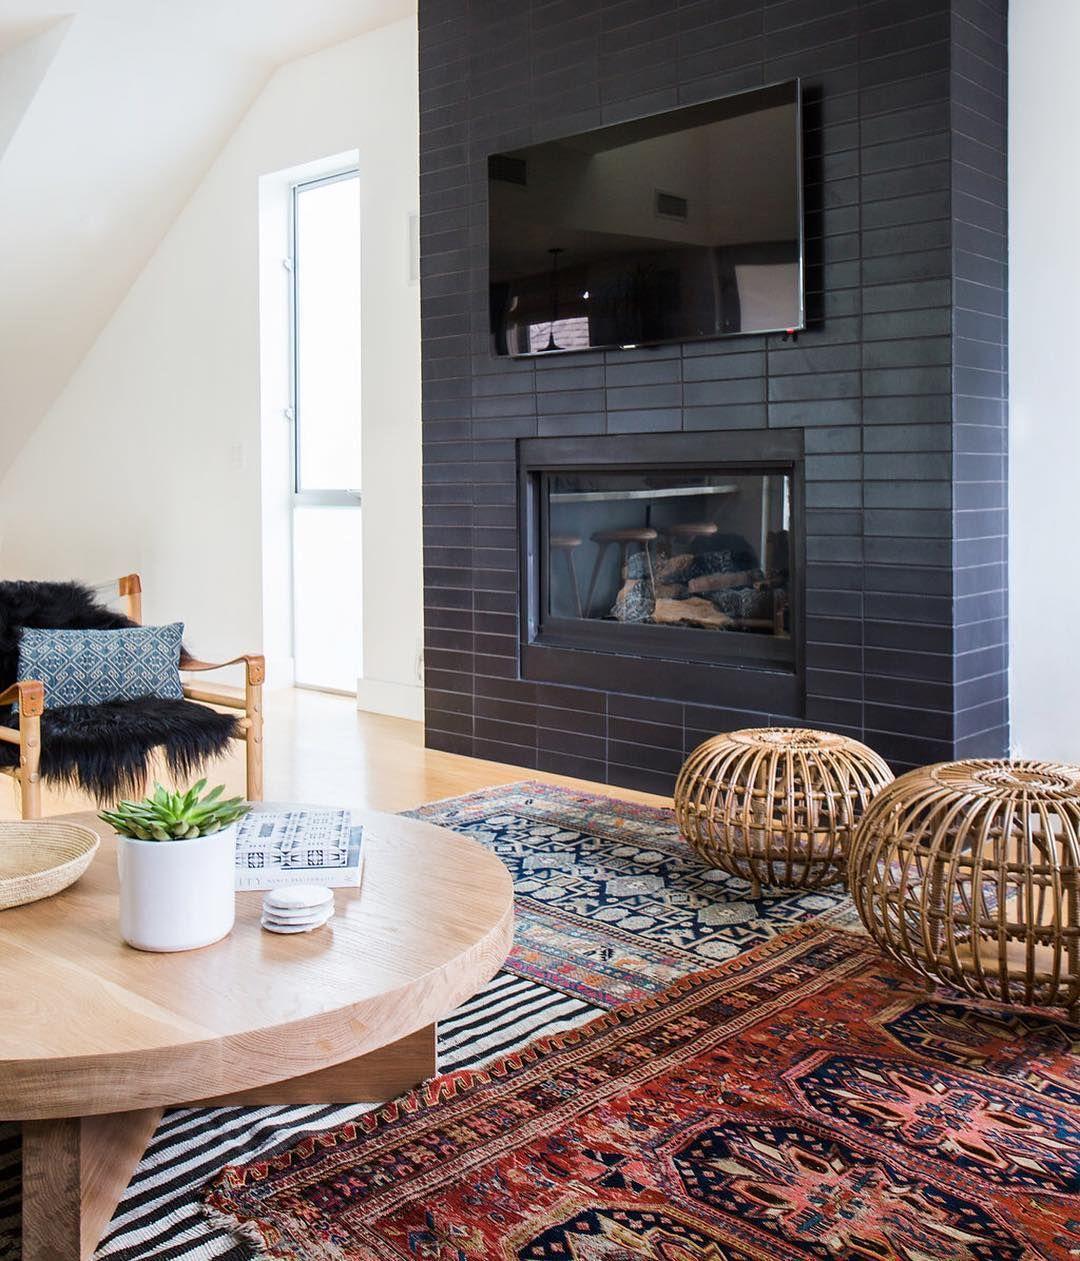 Heath Tile On Fireplace Design By Amber Interiors Photo By Tessa Neustadt Dwell Dark Living Rooms Black Fireplace I Amber Interiors